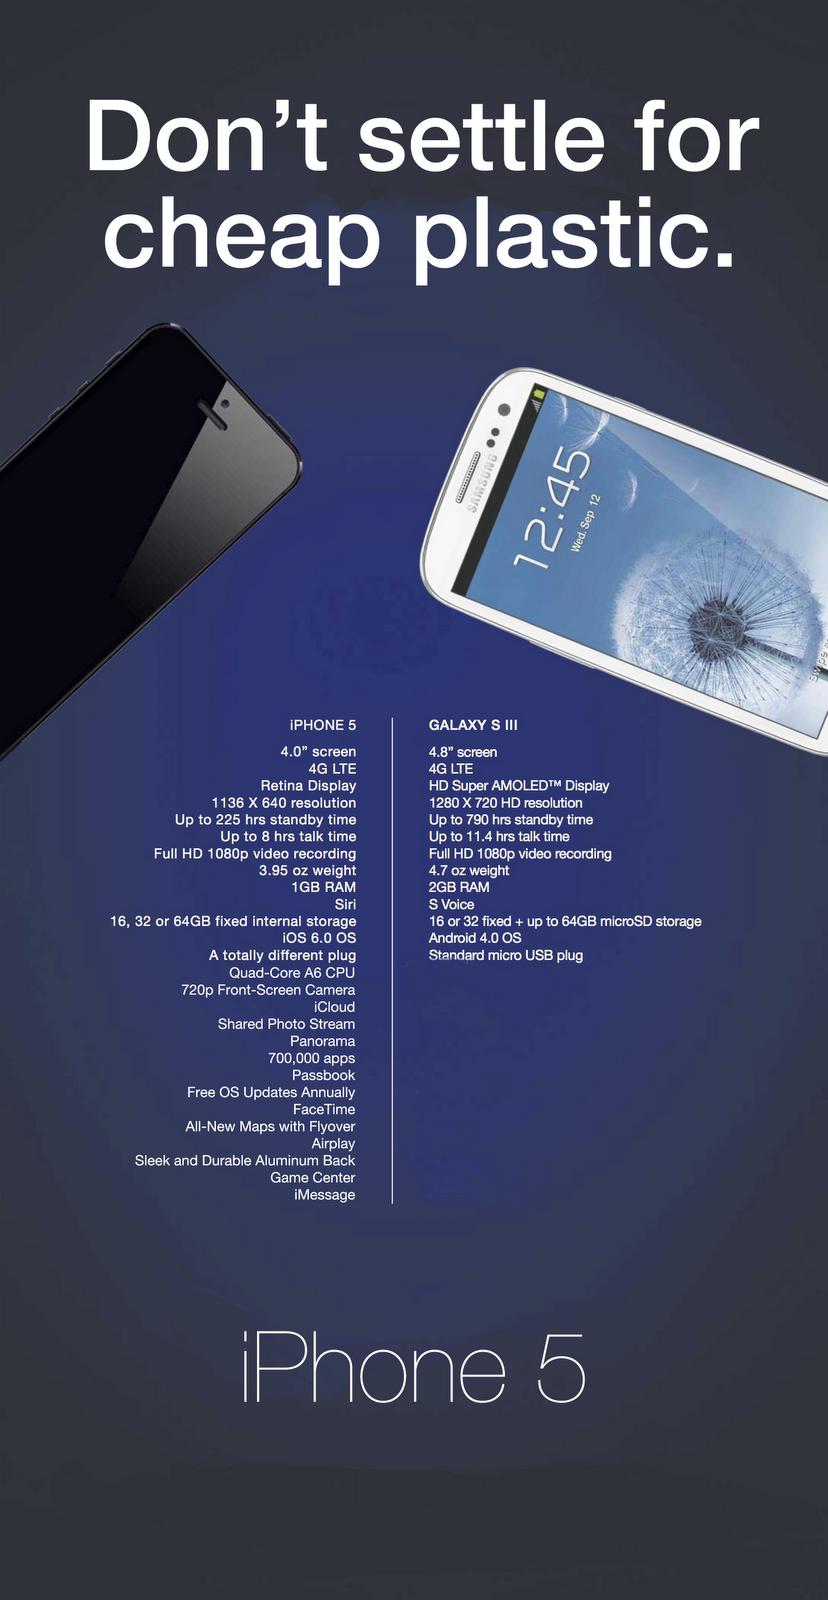 Samsung's Anti-iPhone 5 Ad, Comparison of Galaxy S III & iPhone 5